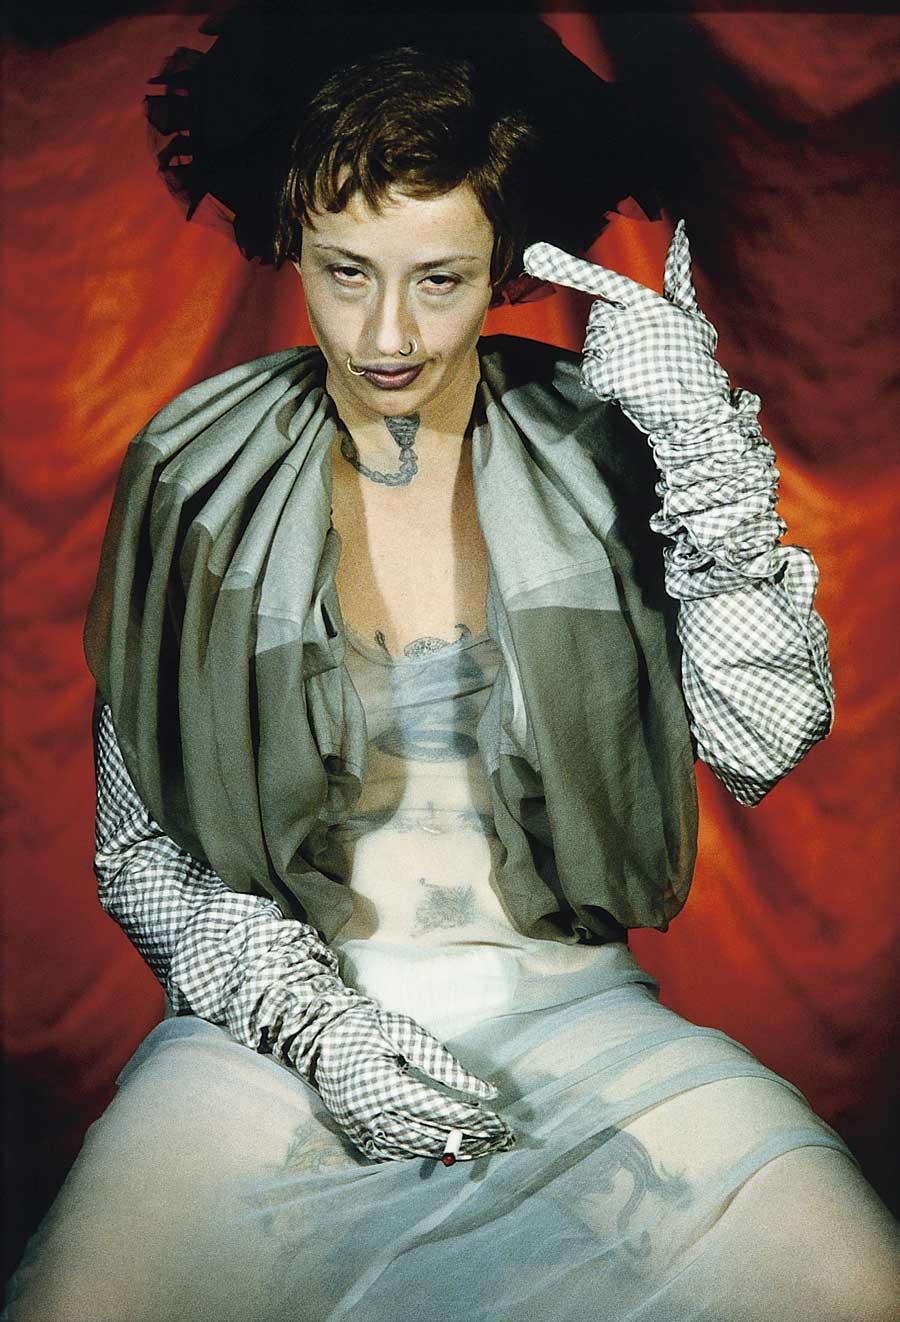 artist cindy sherman has taken modern society by the bullhorns